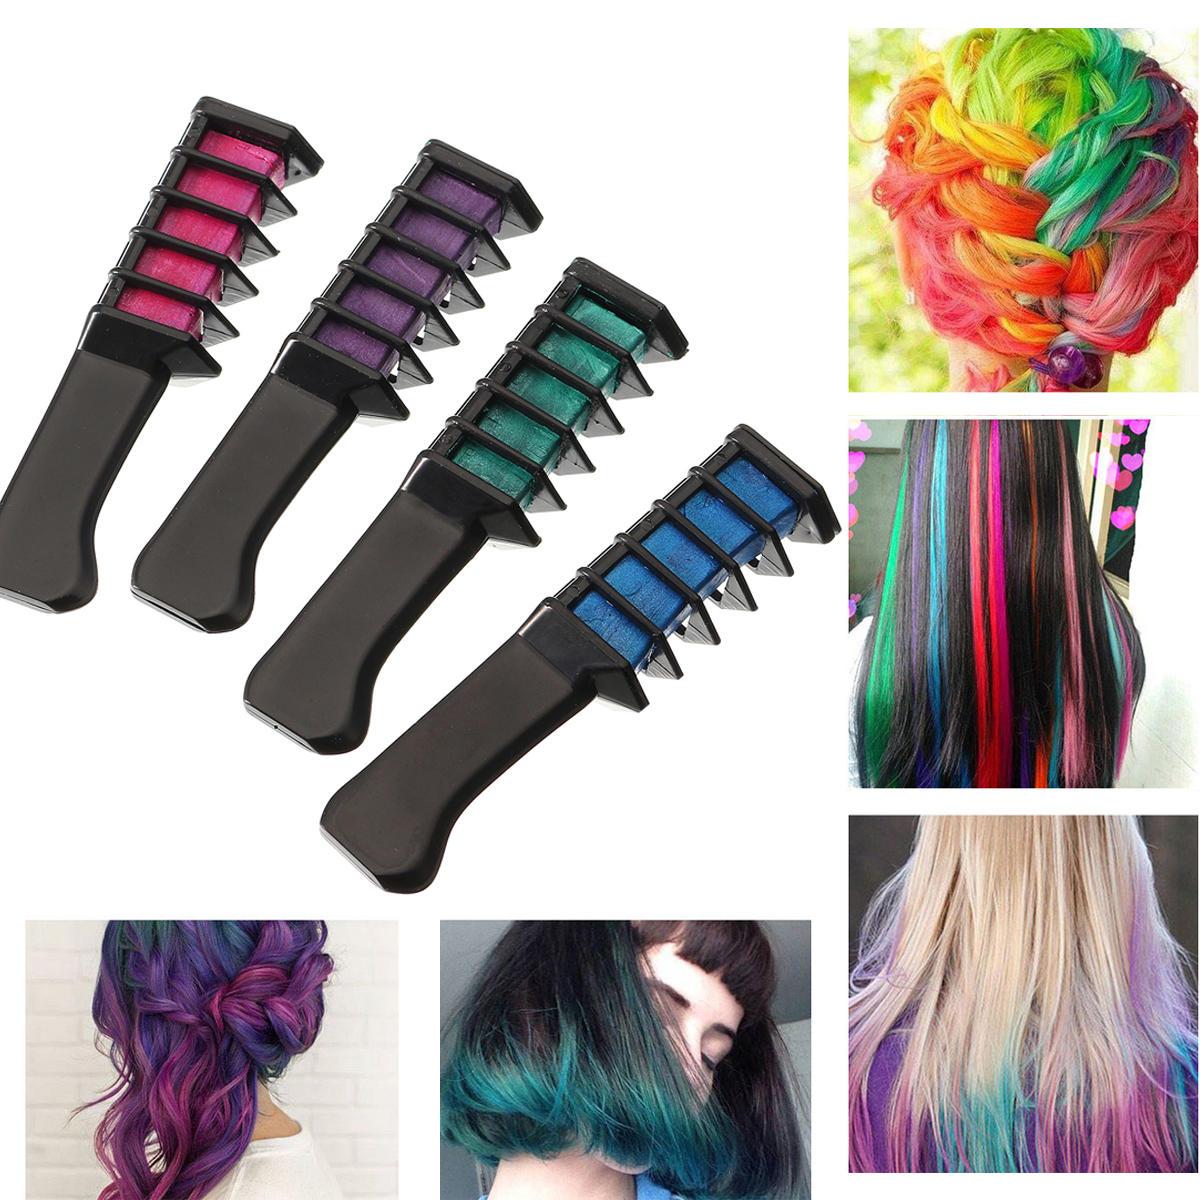 Temporary Dye Color Hair Chalk Soft Pastel Cream Comb Salon Hairbrush